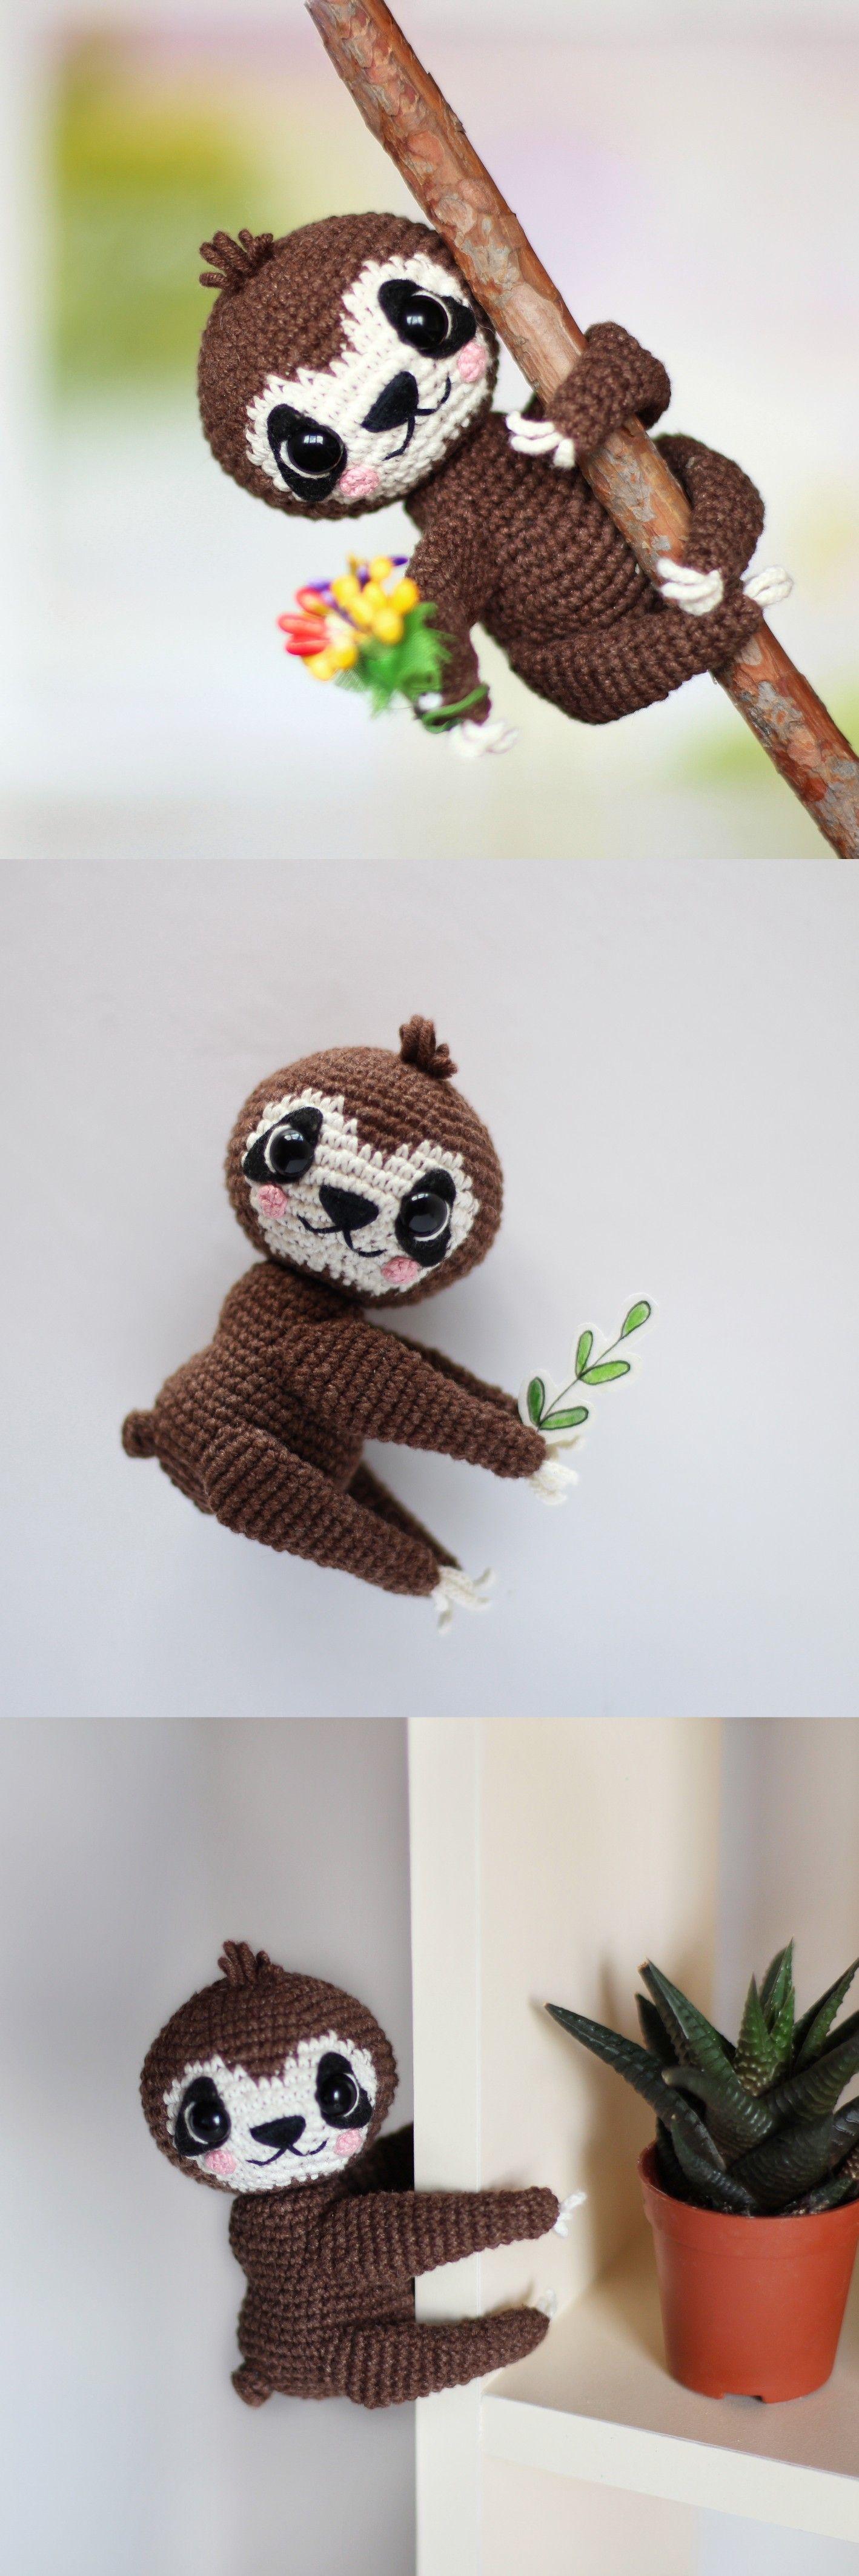 PATTERN crochet SLOTH pdf amigurumi toy how crochet sloth